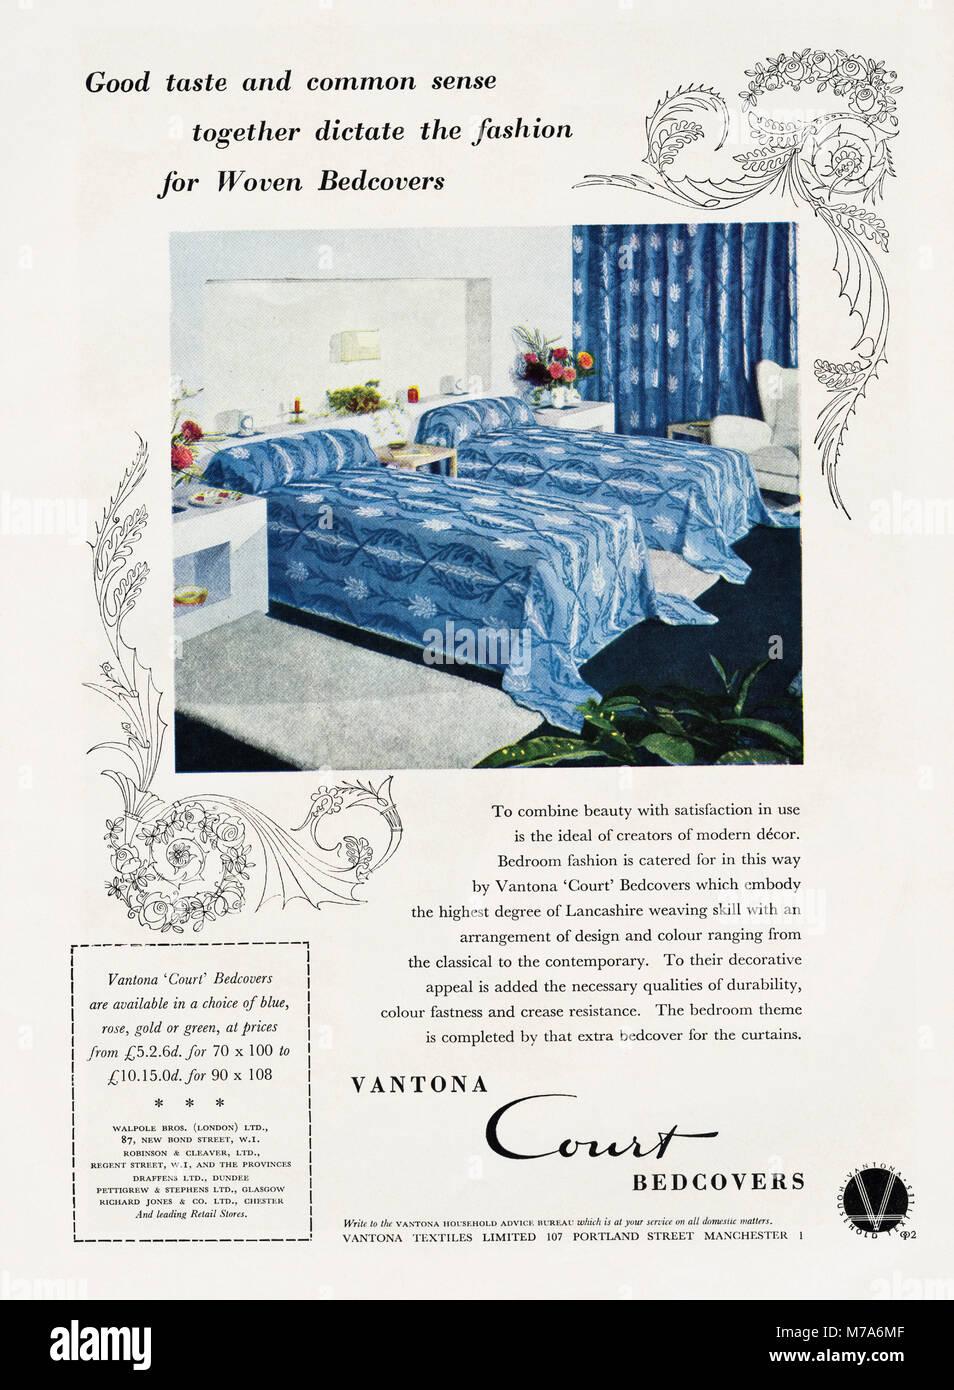 1950s original old vintage advertisement advertising vantona court